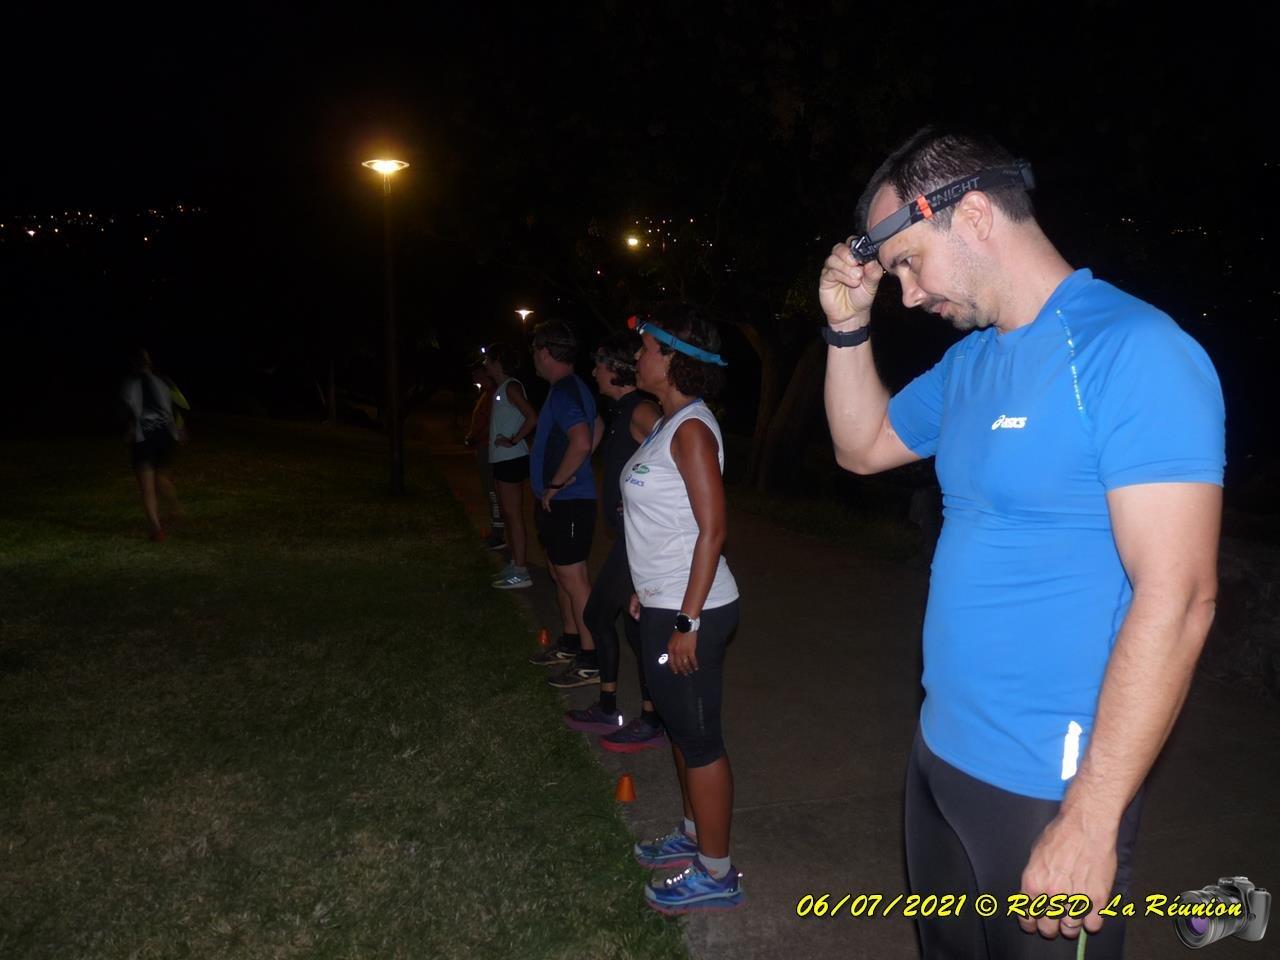 20210706 Entrain Trail Trinité 001